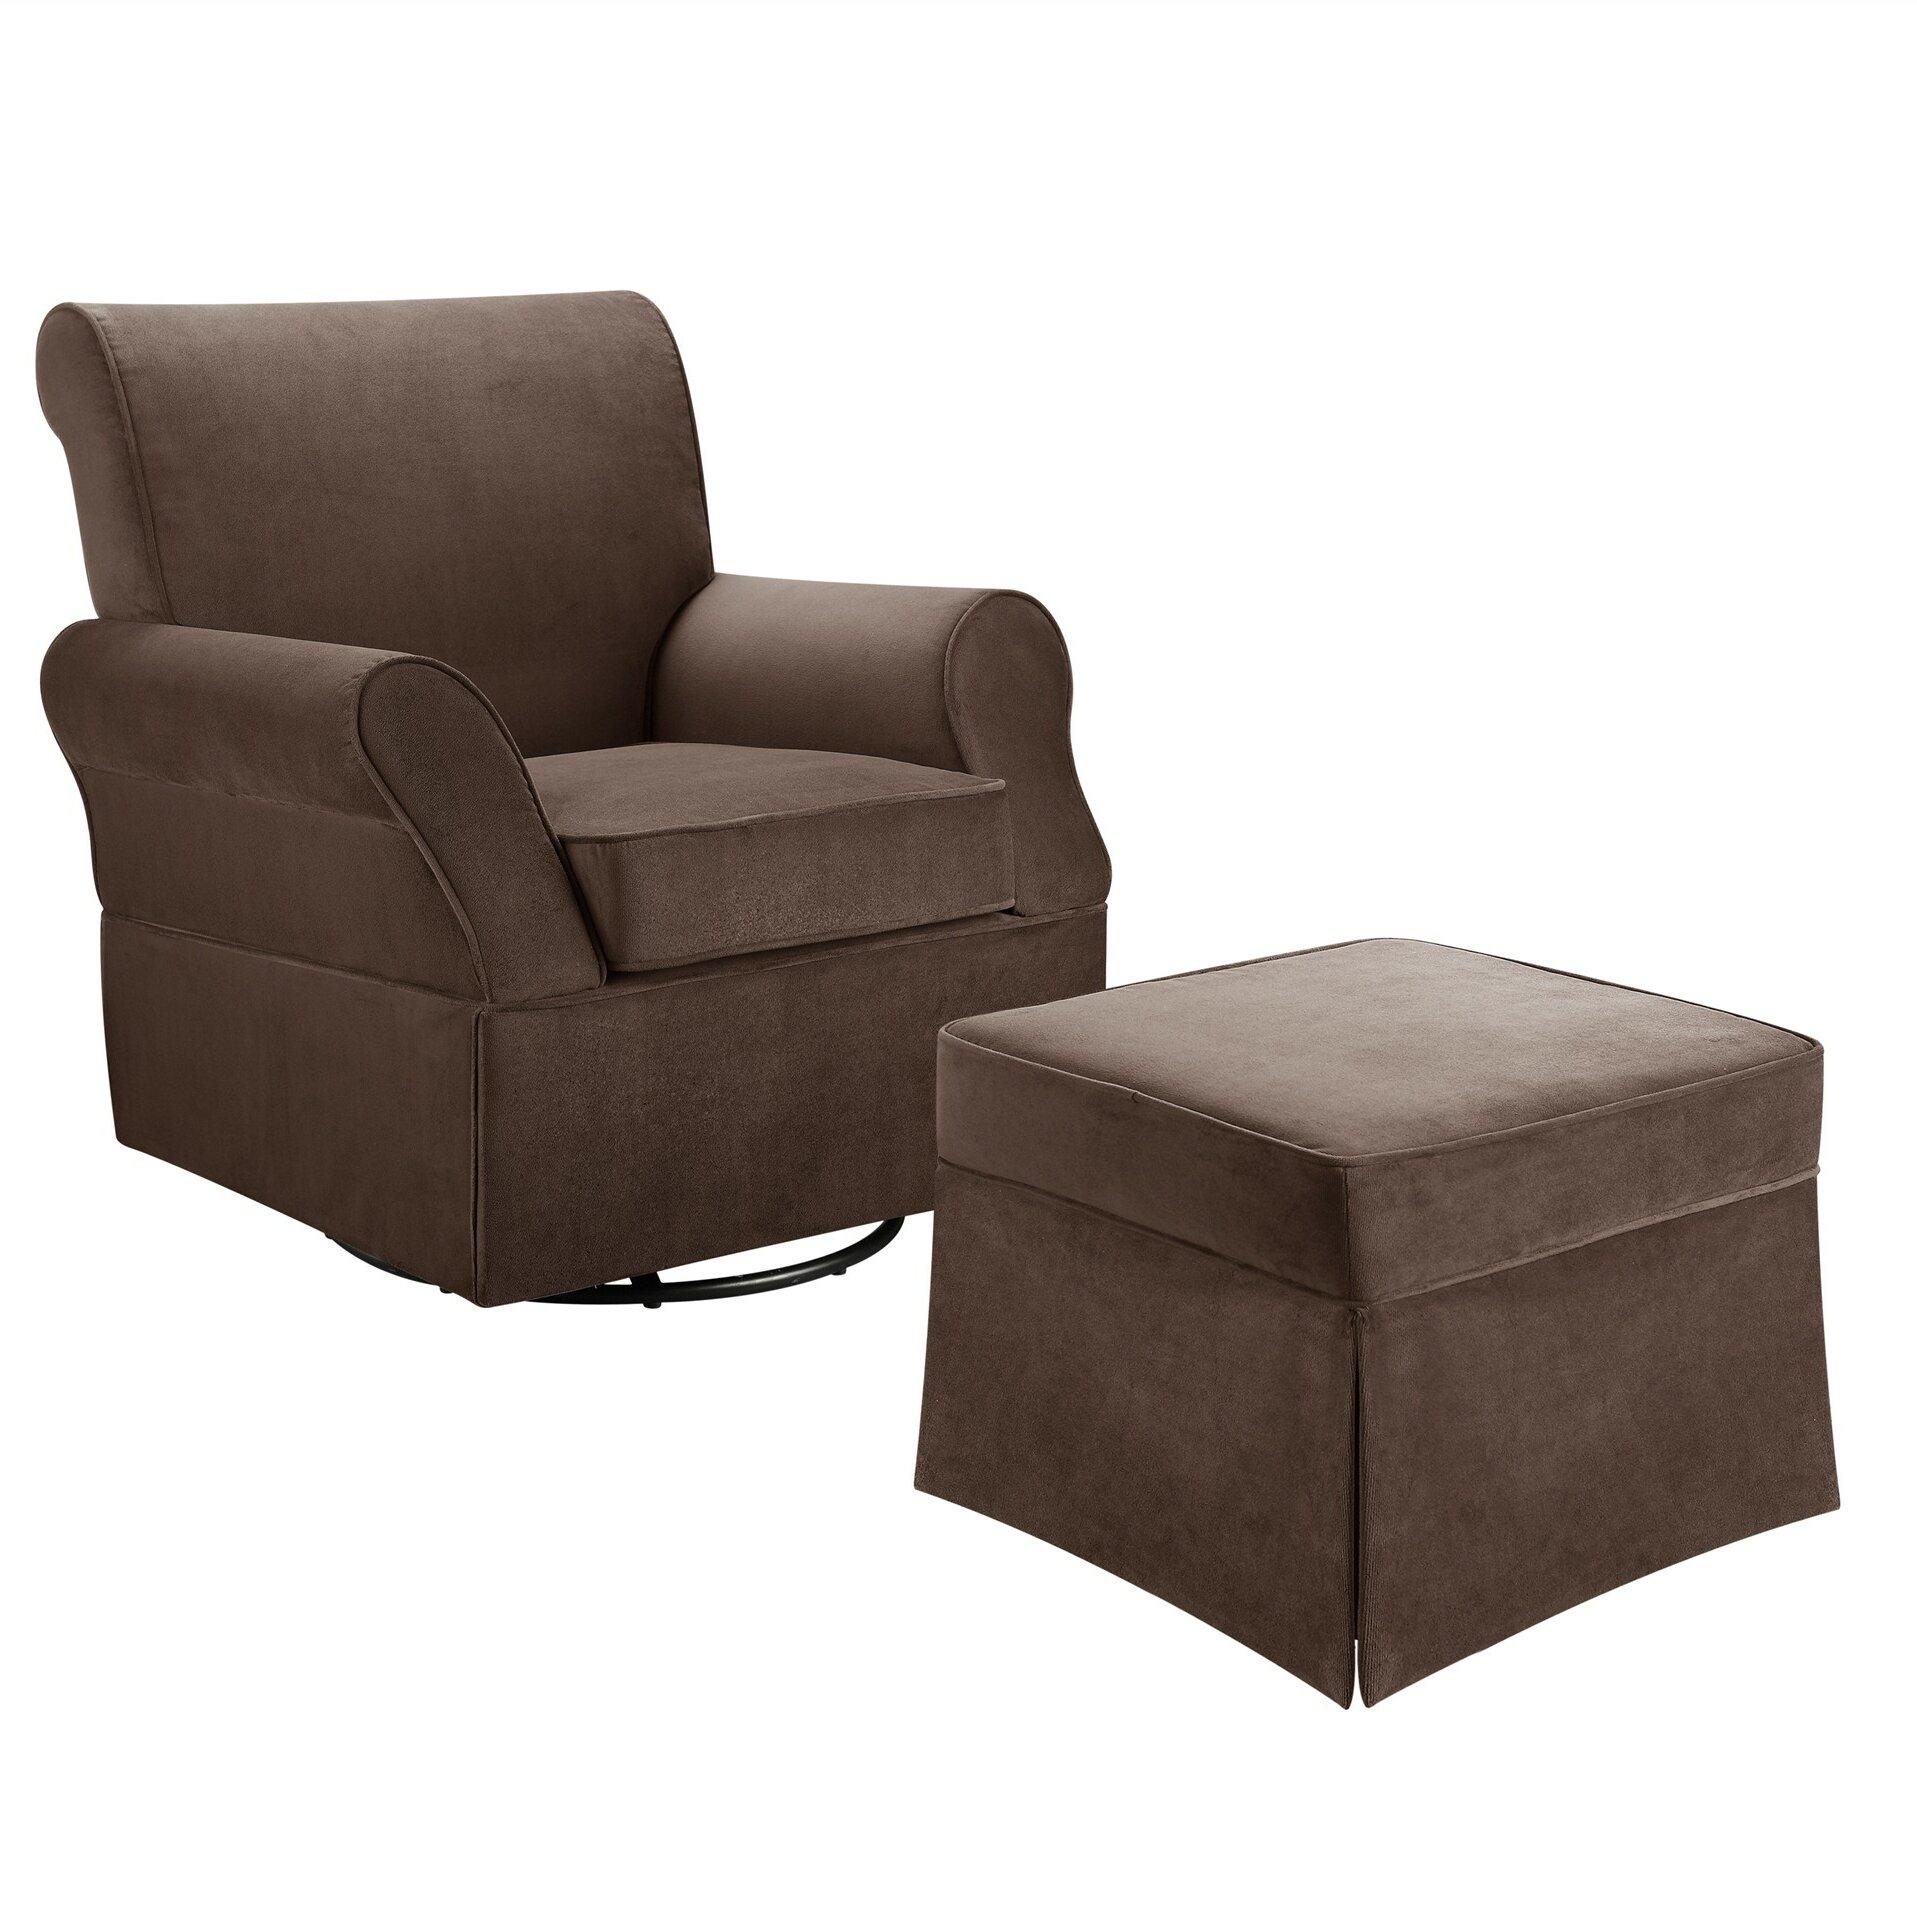 Upholstered swivel rocking chair gliders amp ottomans wayfair